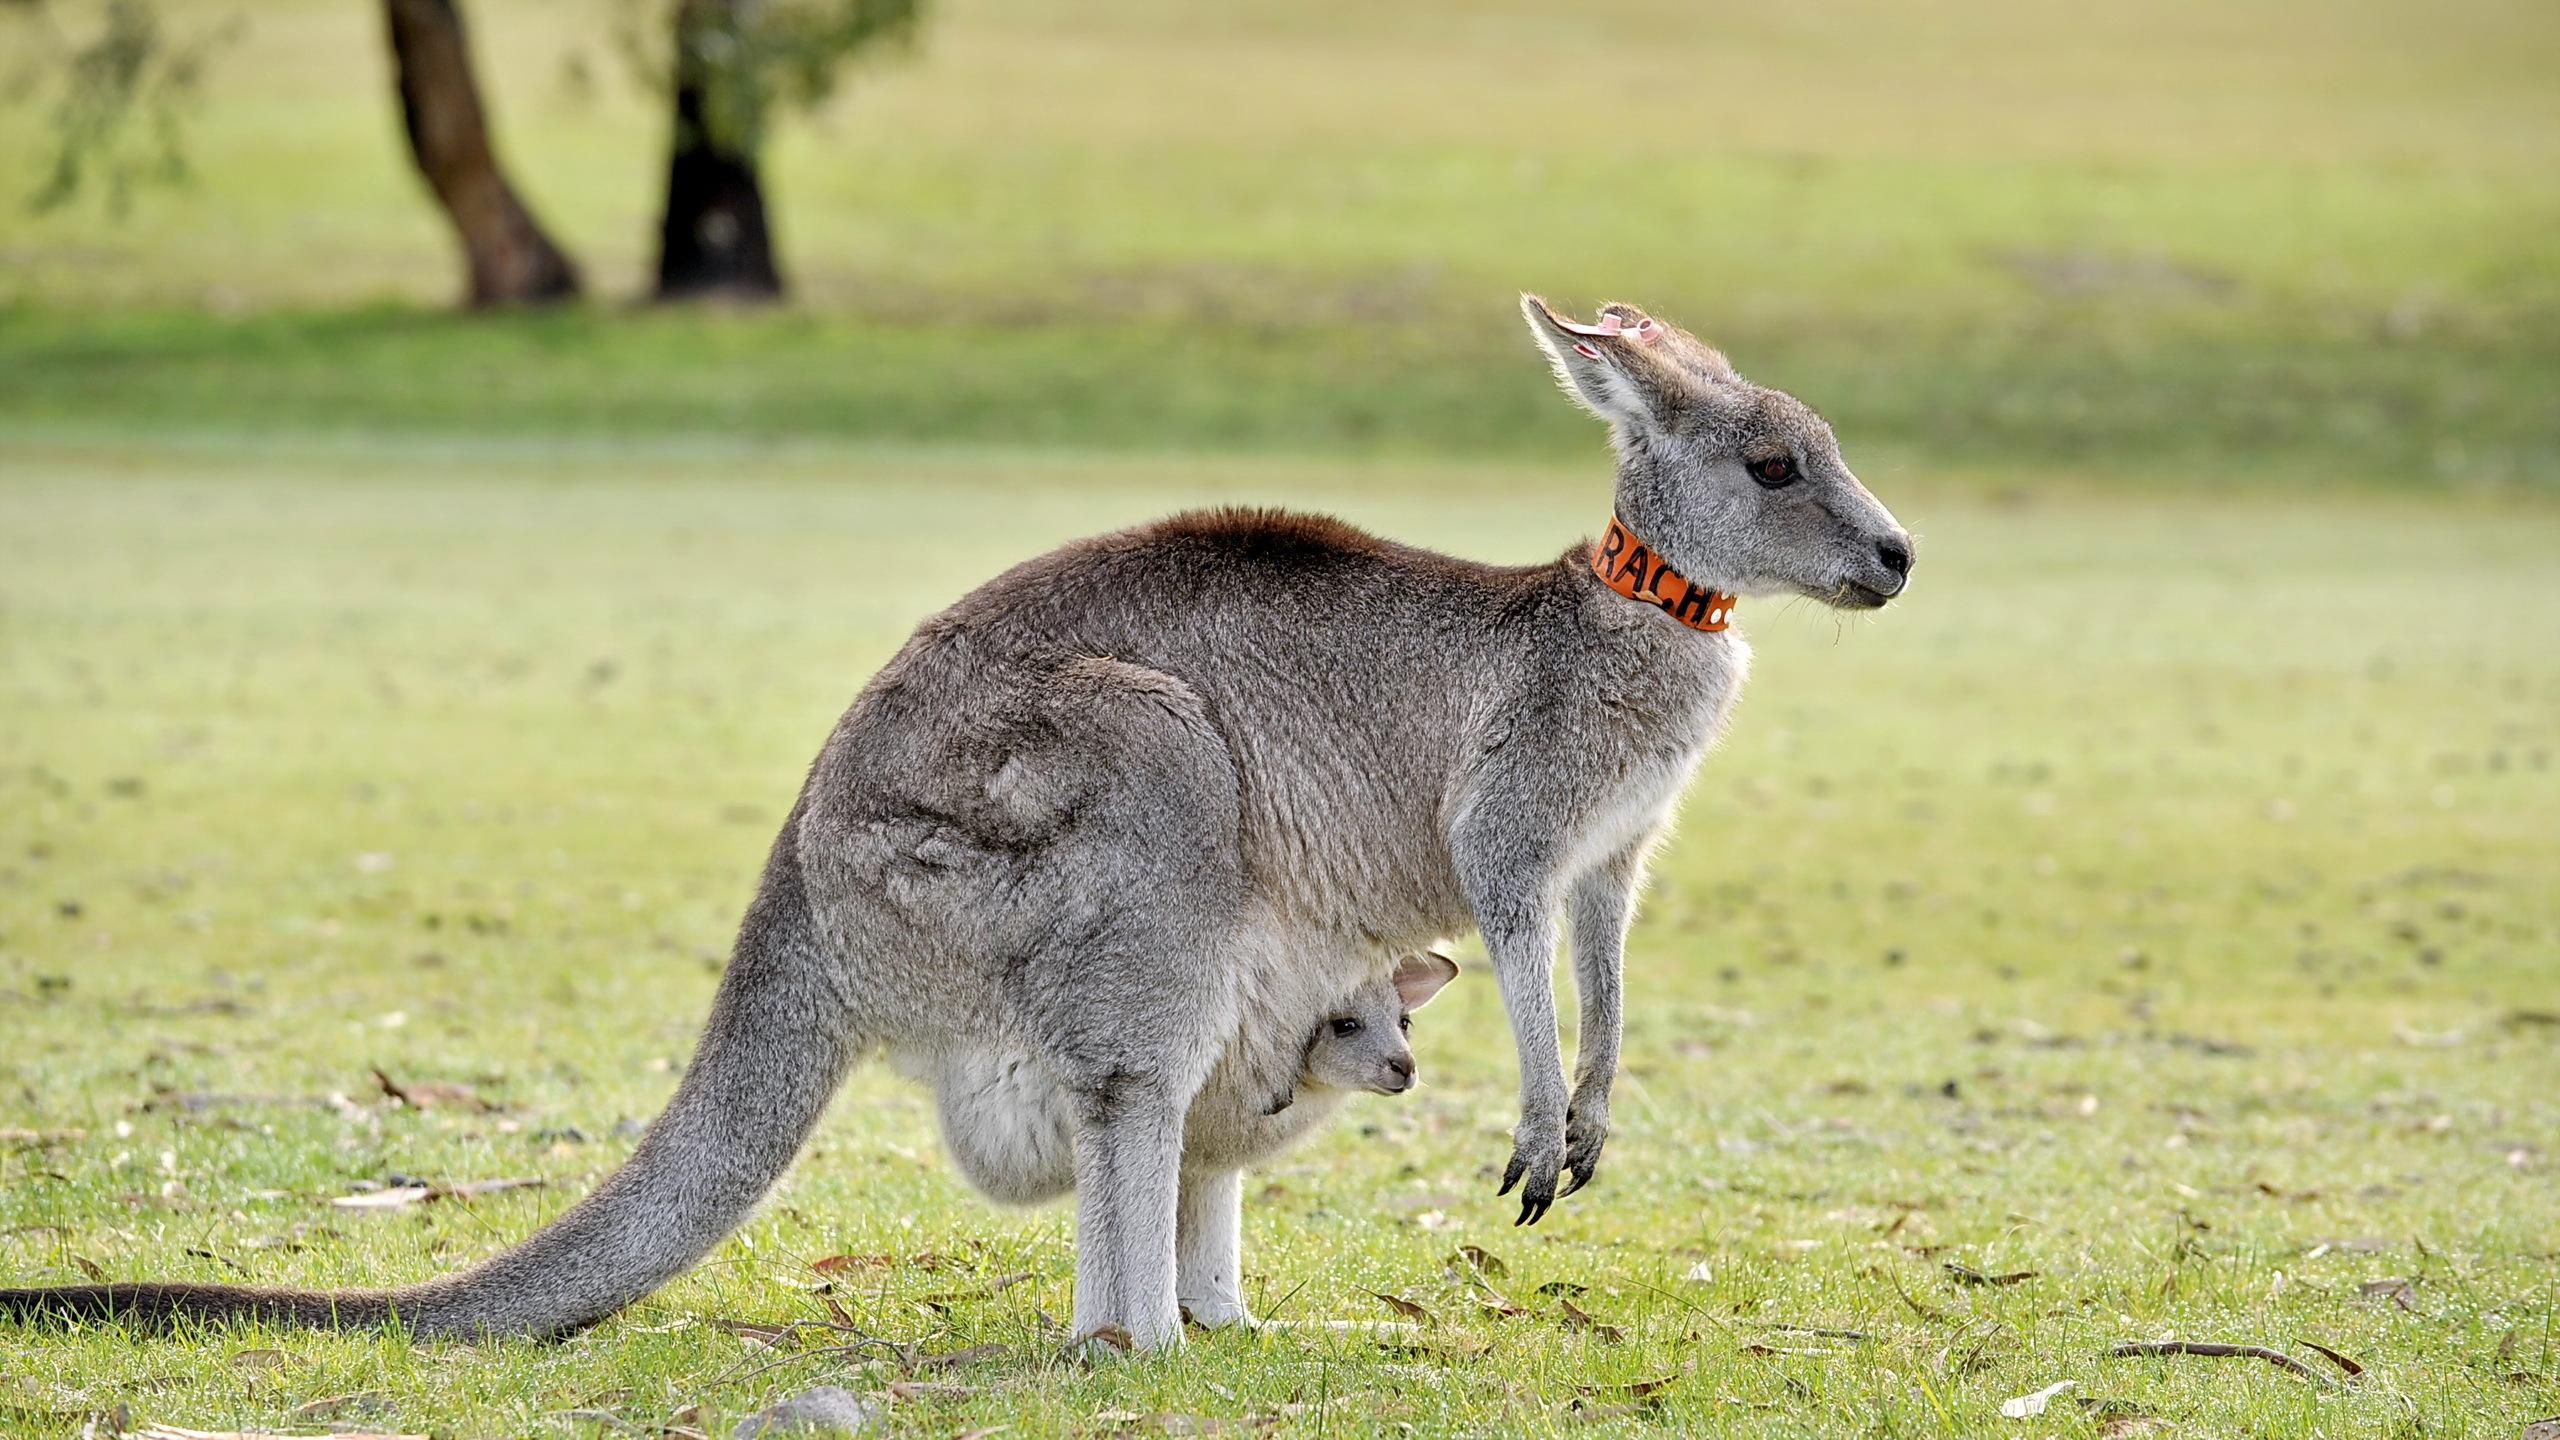 Kangaroo High Definition Wallpapers